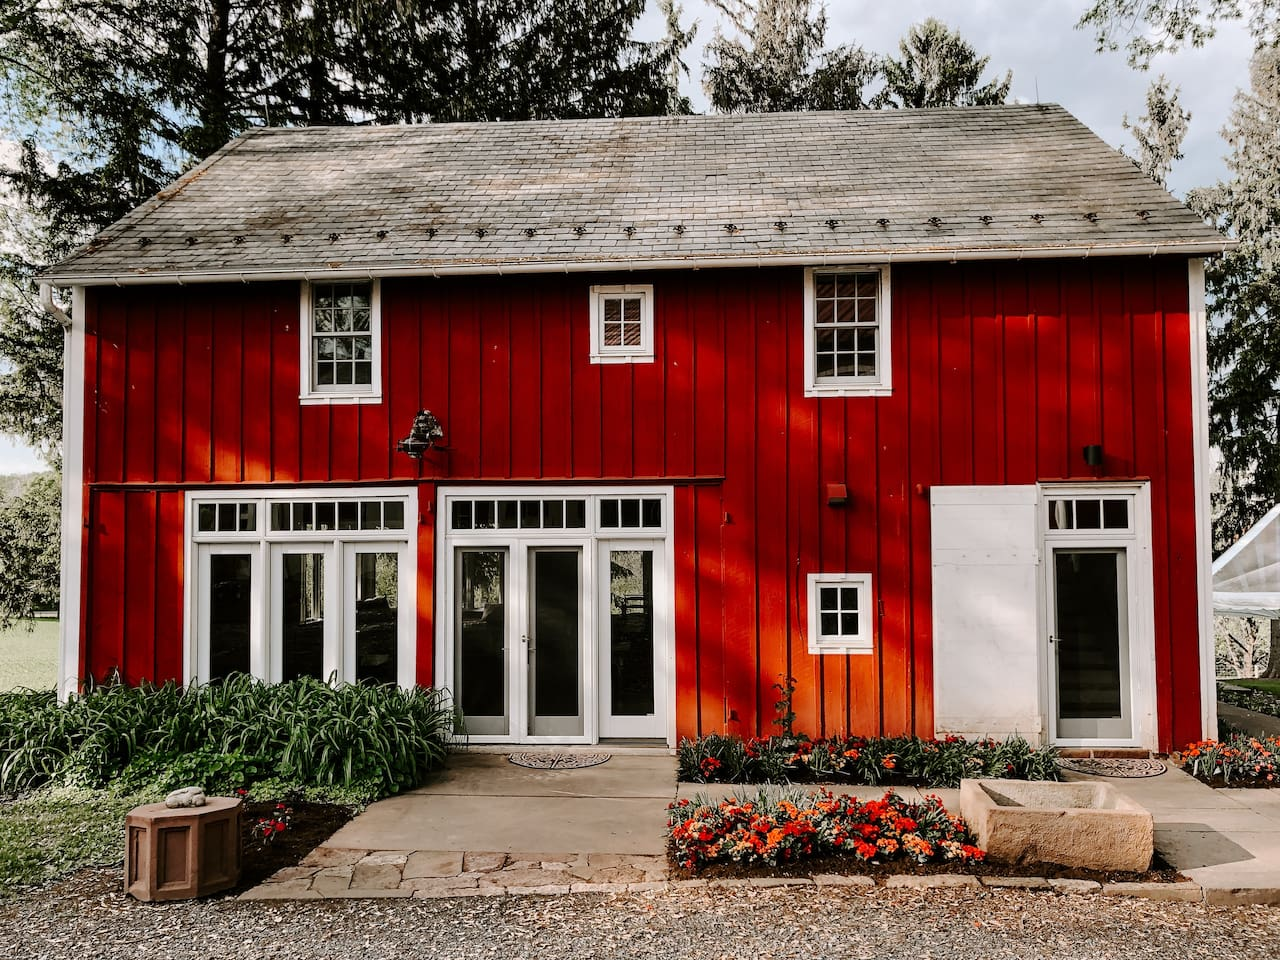 Hopeland Farm Red House